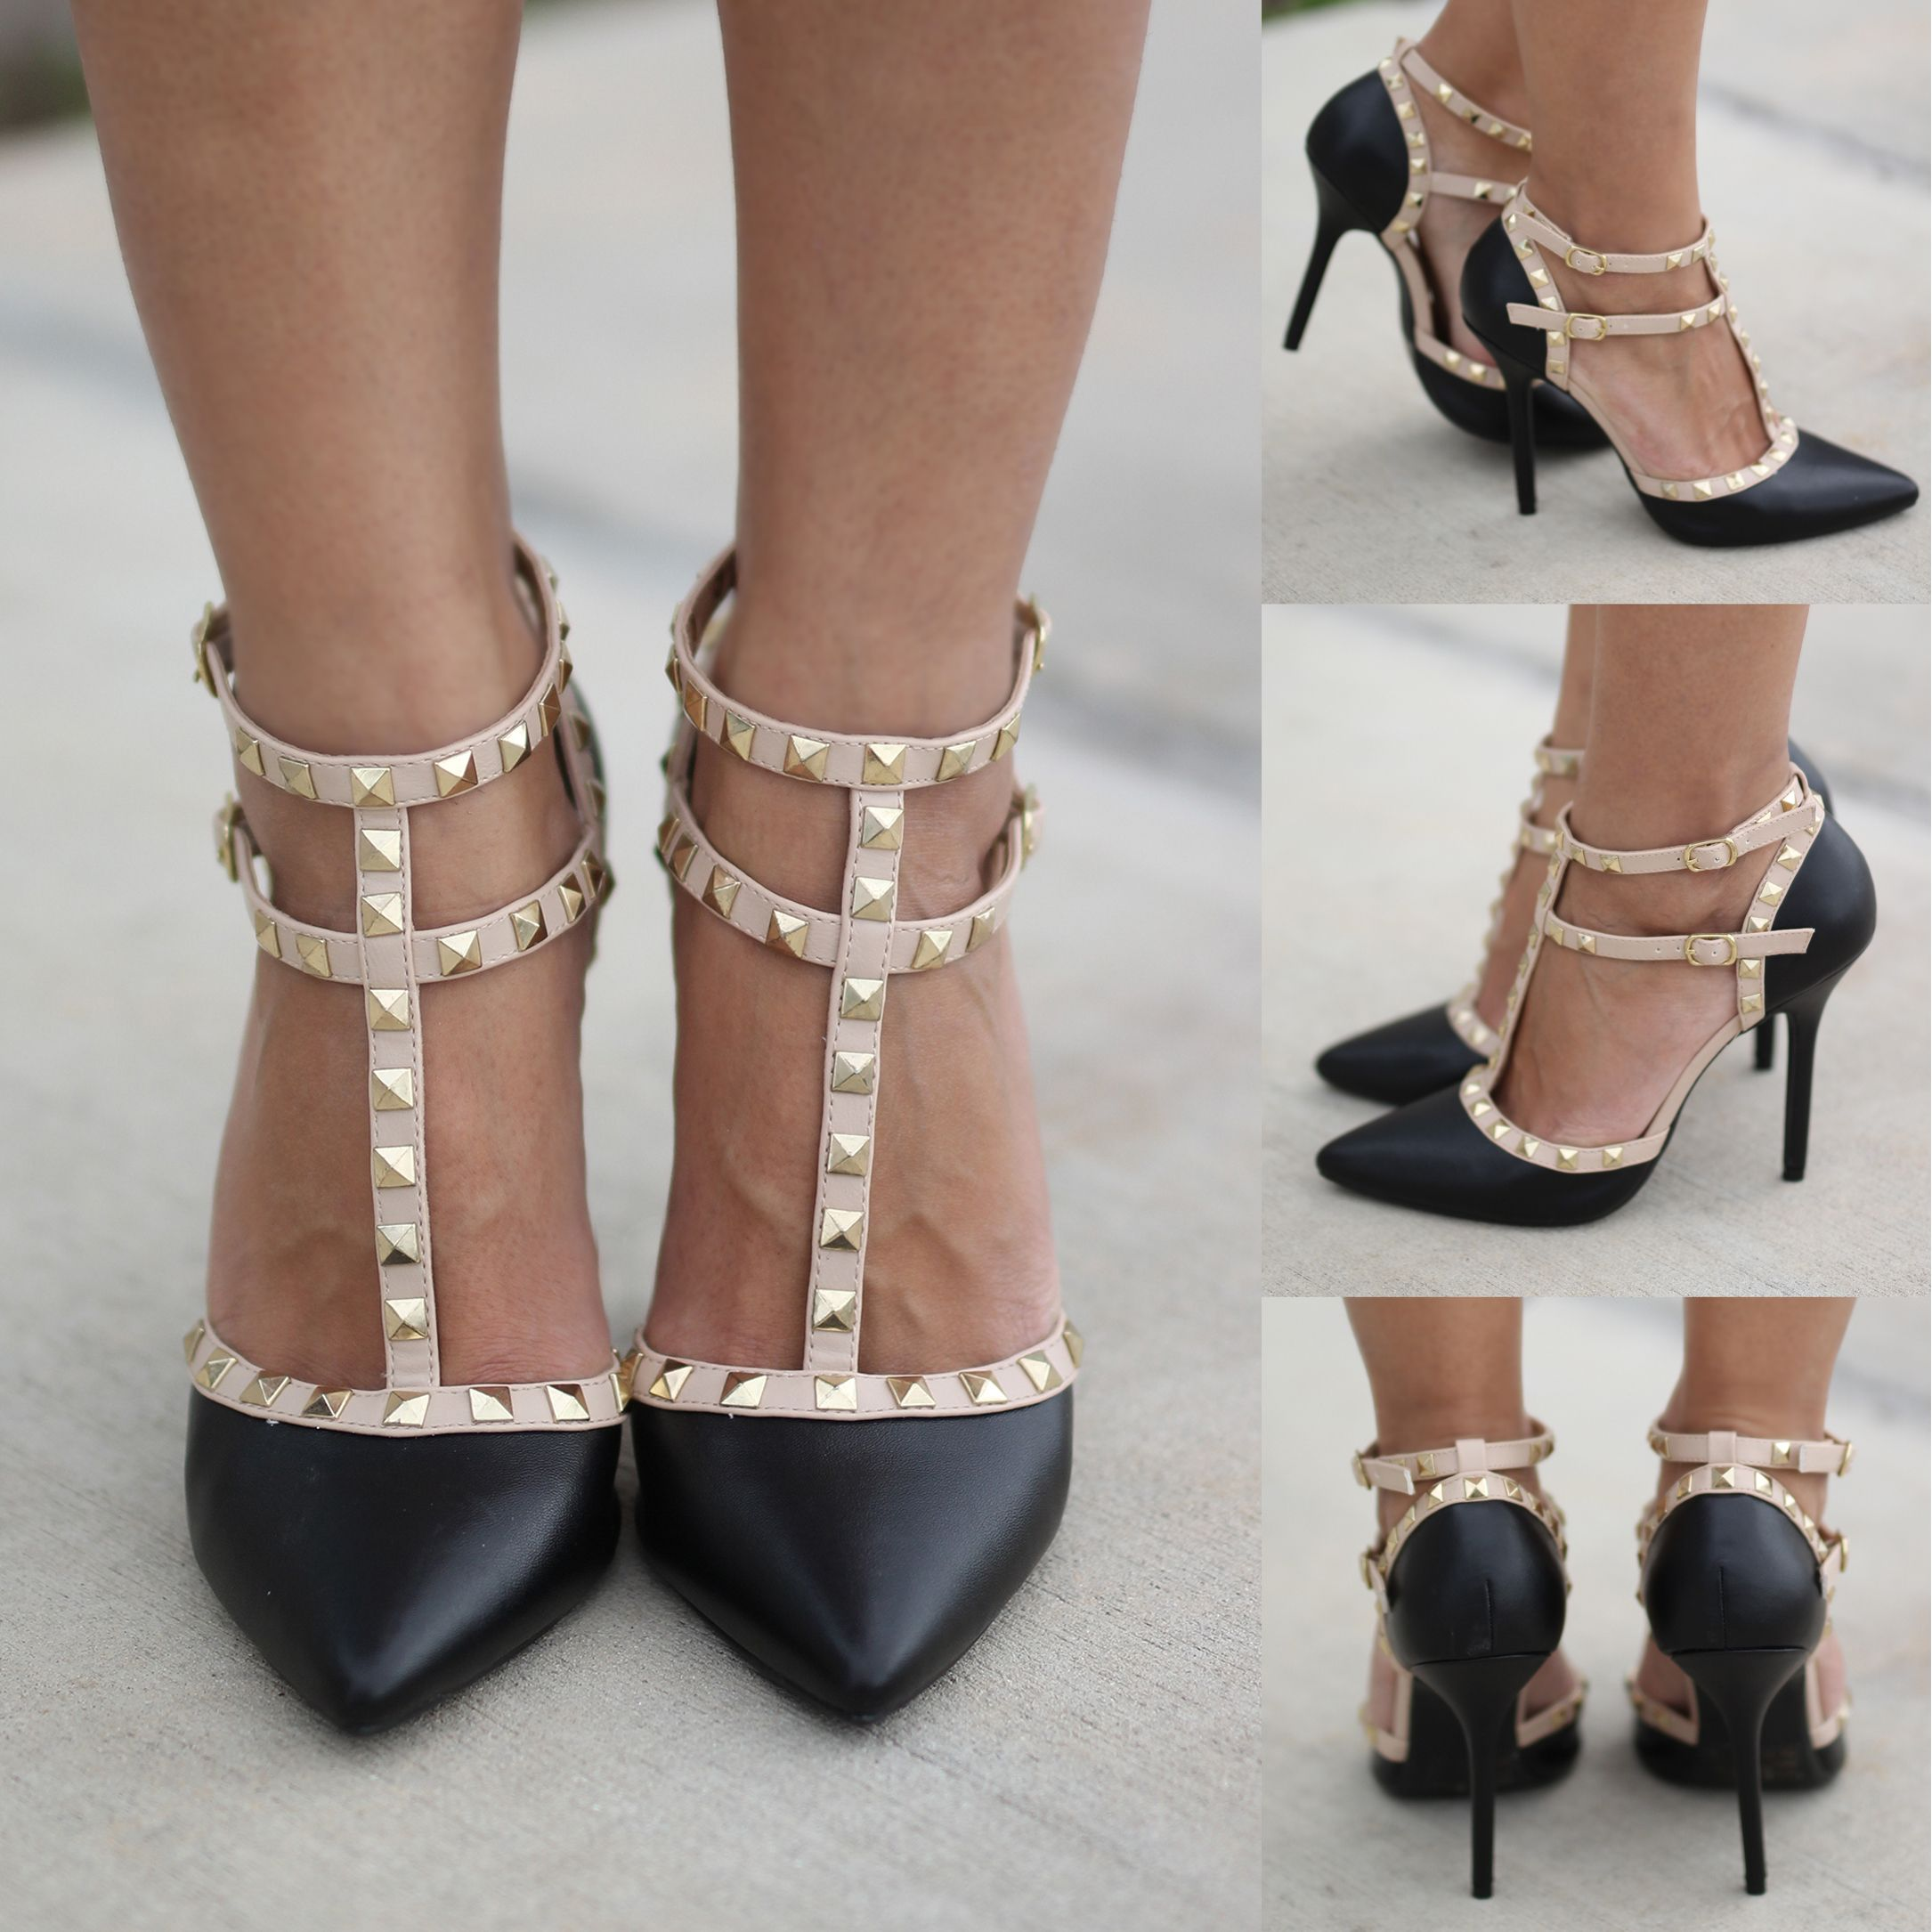 Black Studded Strappy Heels   Heels